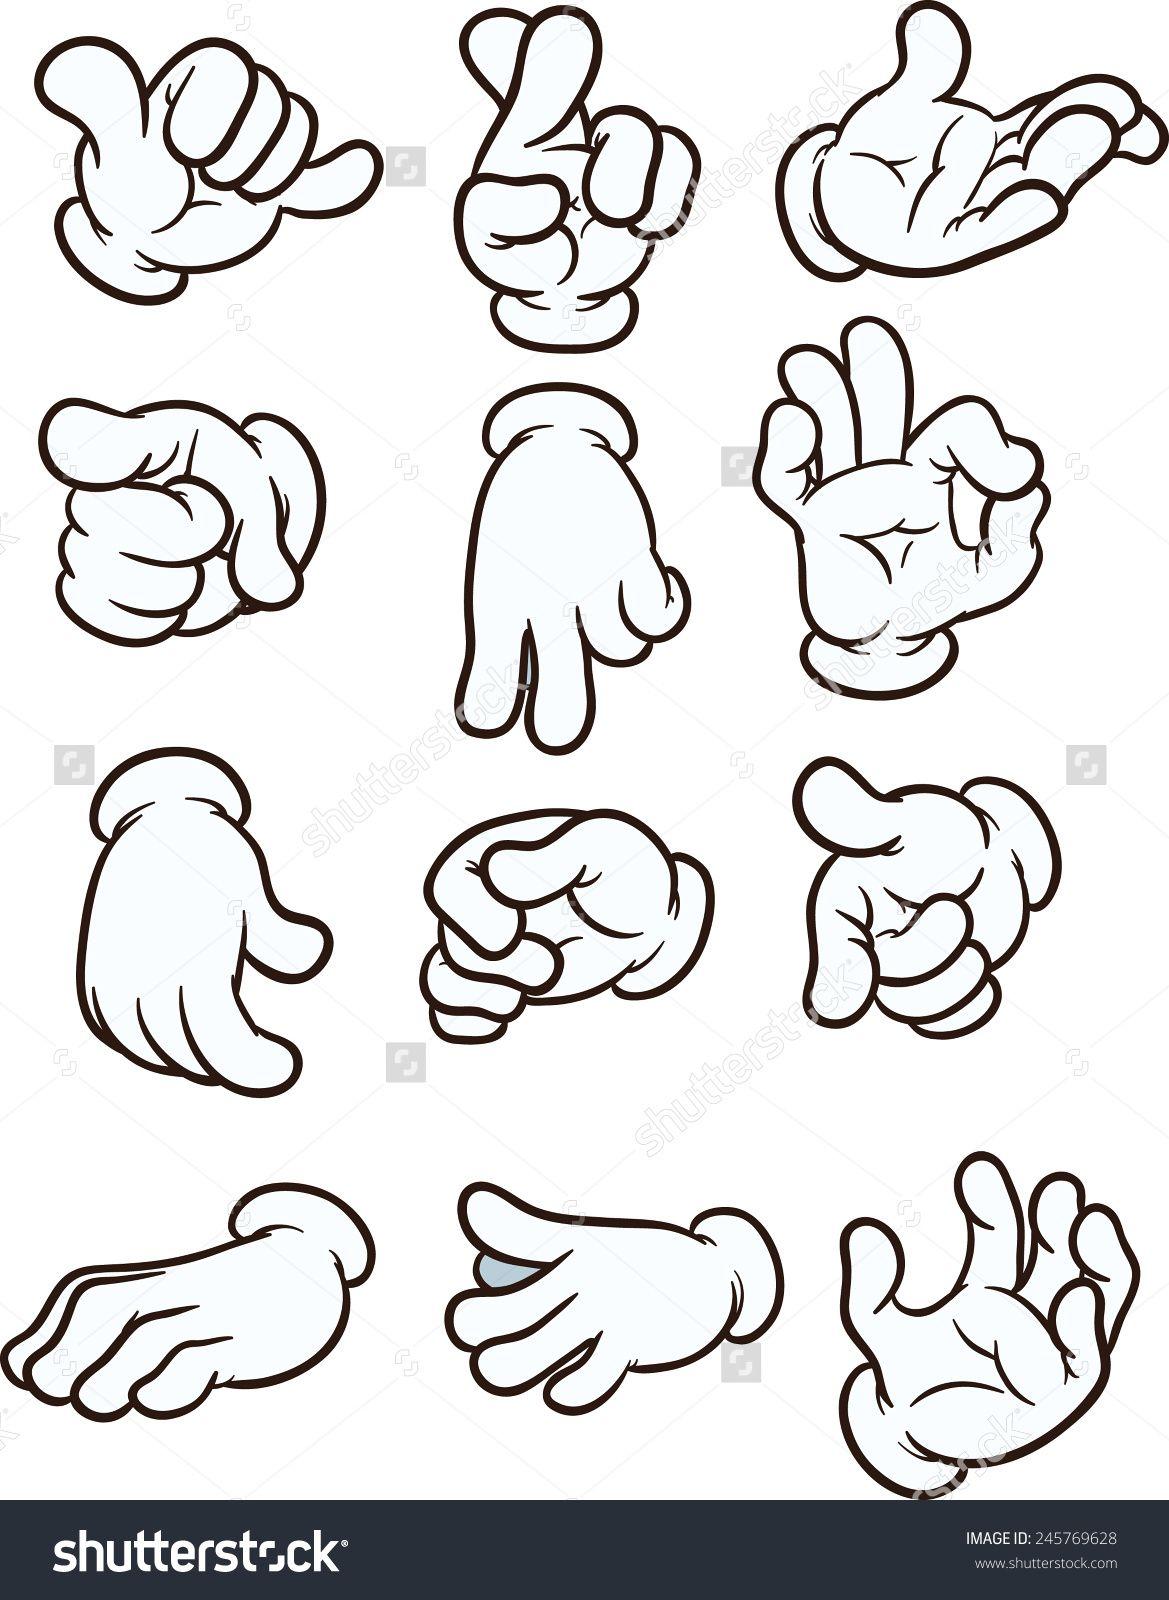 cartoon hands - Google Search   Cartoon drawing